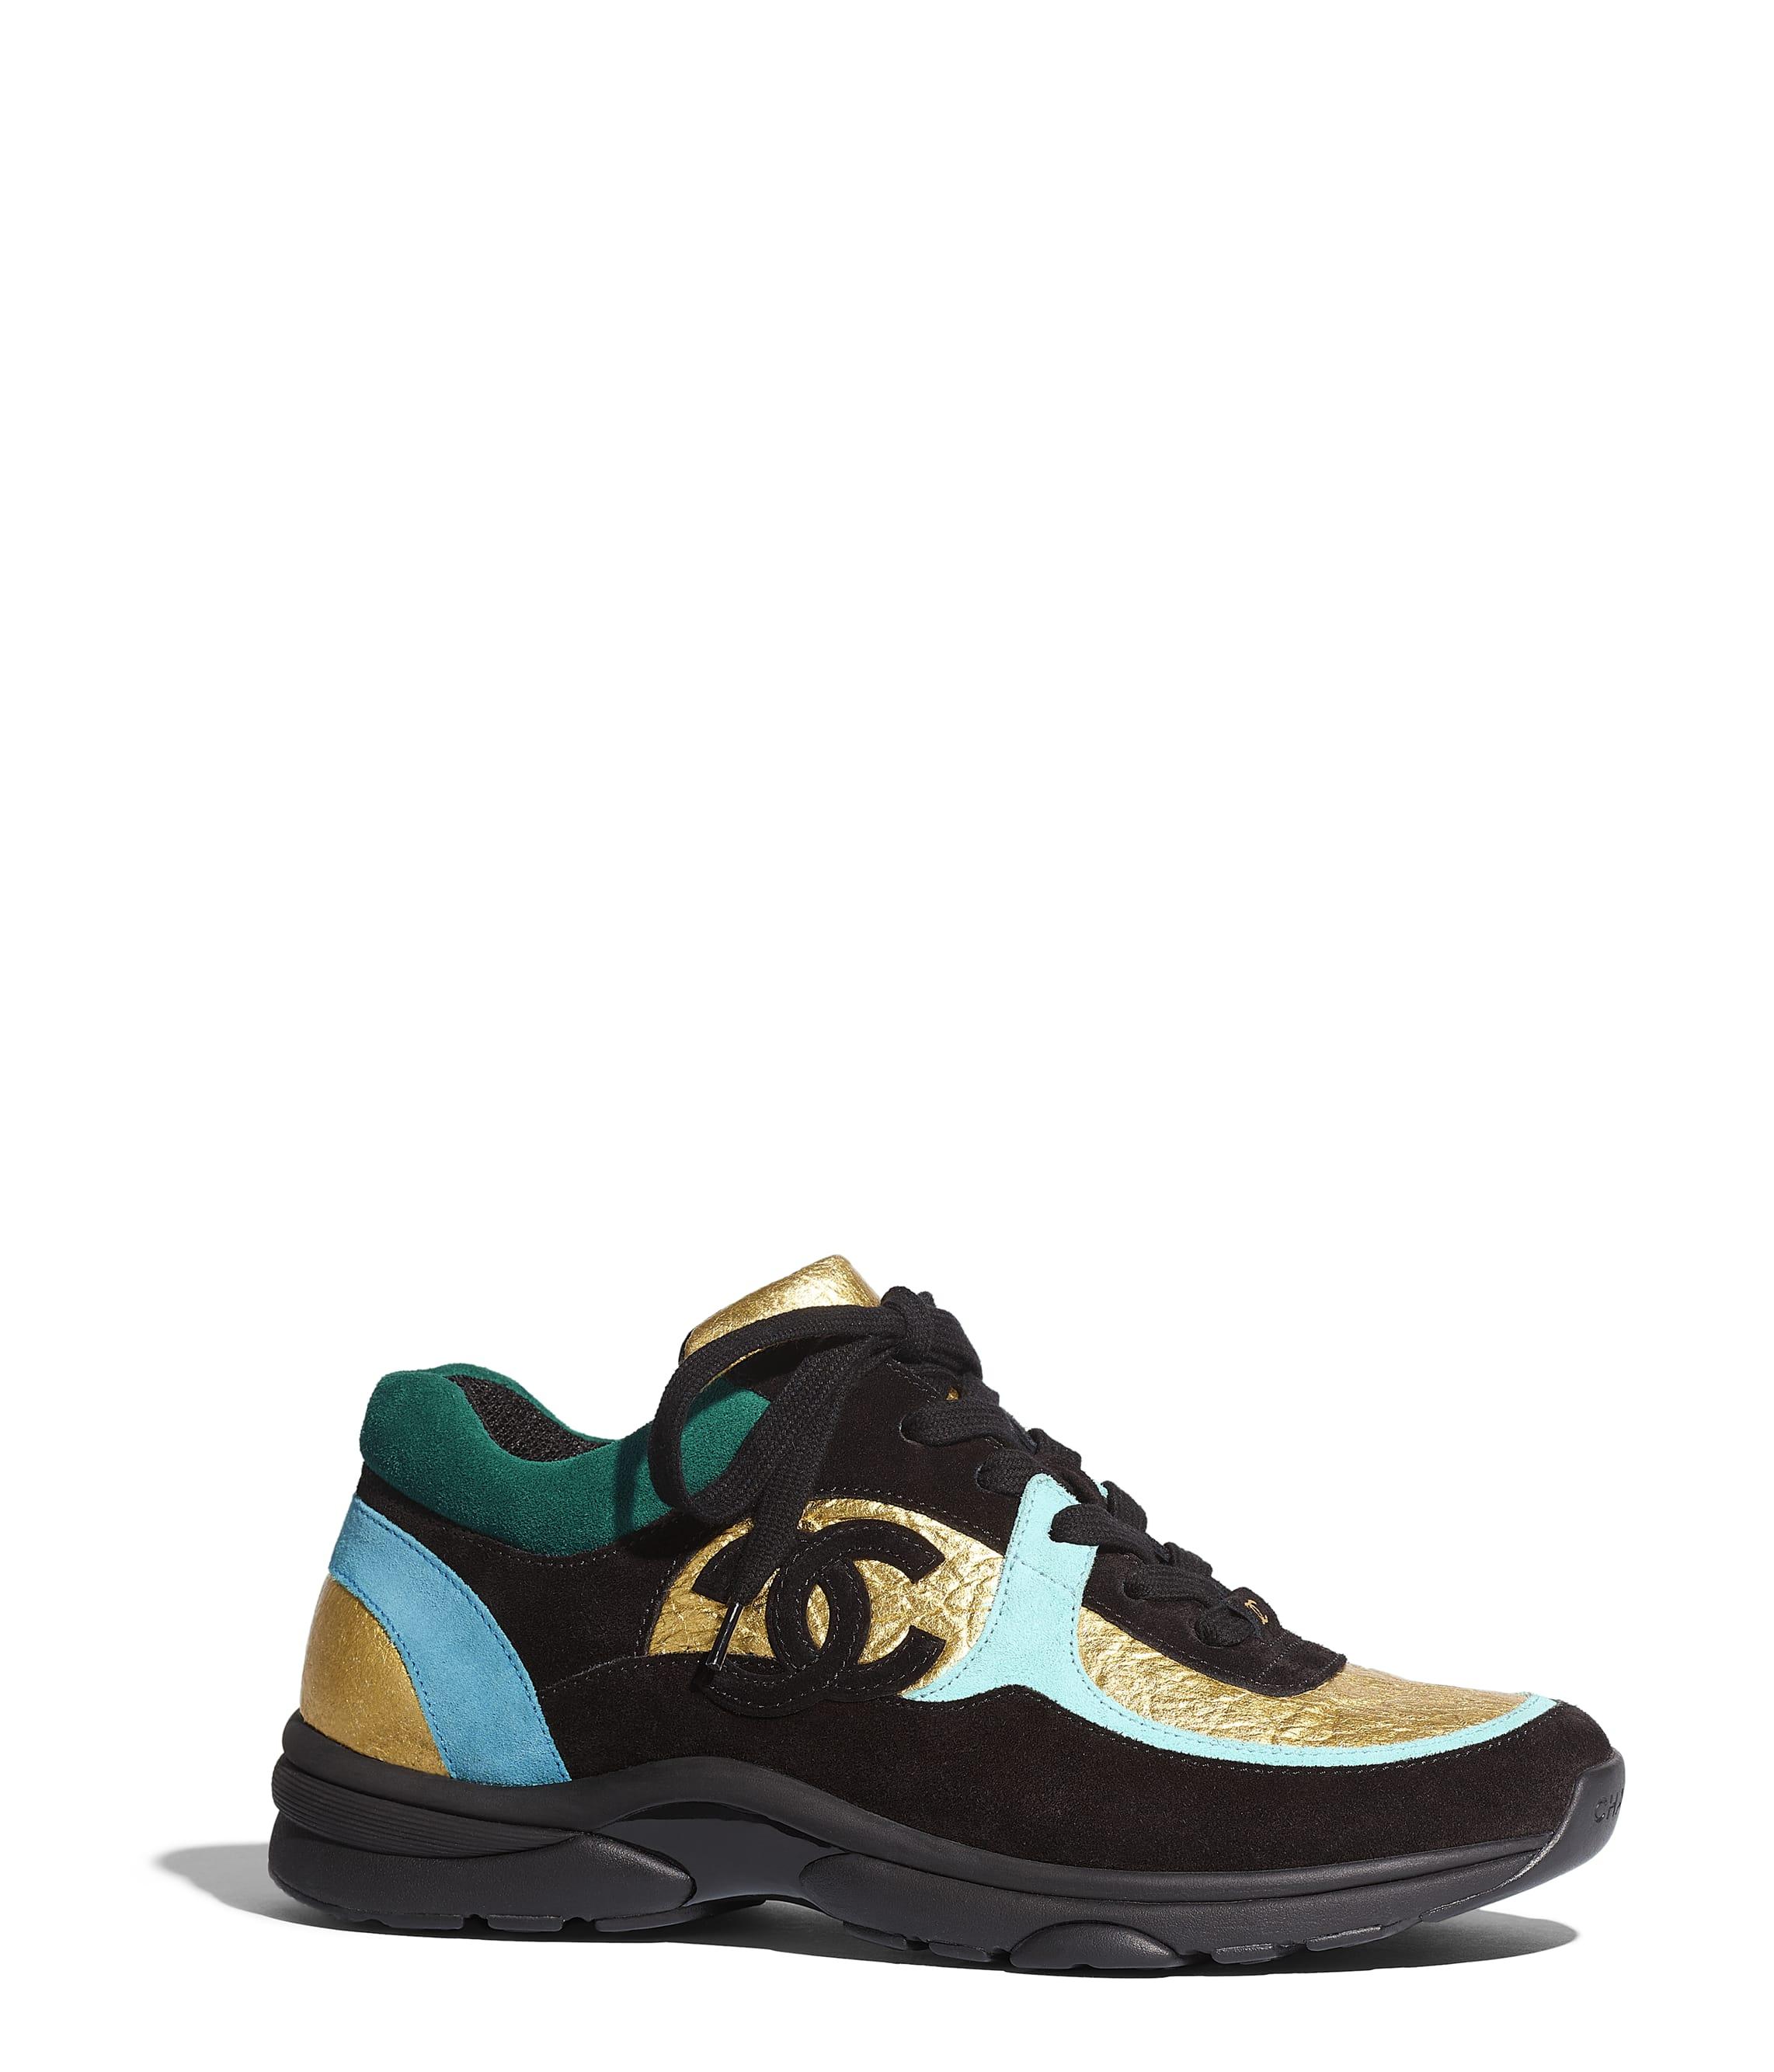 1e5f9eb4961 Sneakers - Shoes - CHANEL